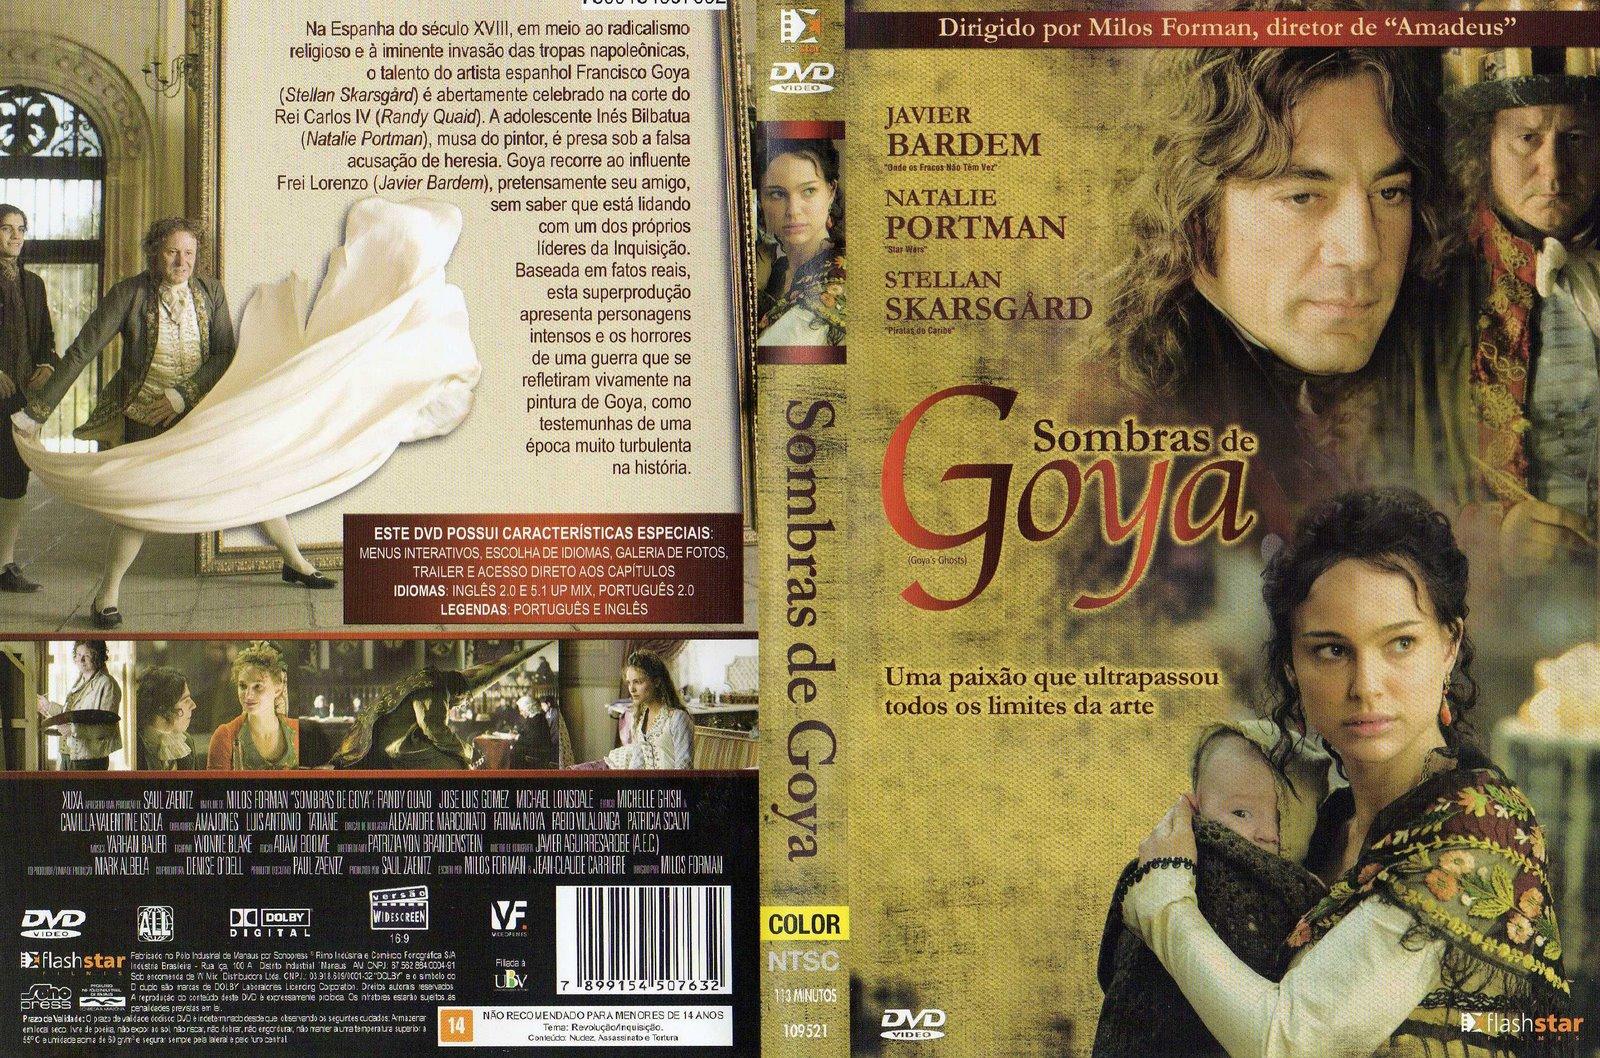 http://4.bp.blogspot.com/_GqpLe7EsmXI/S7CjFTWsHRI/AAAAAAAAAB0/qRr2VJbsg64/s1600/Sombras_De_Goya.jpg